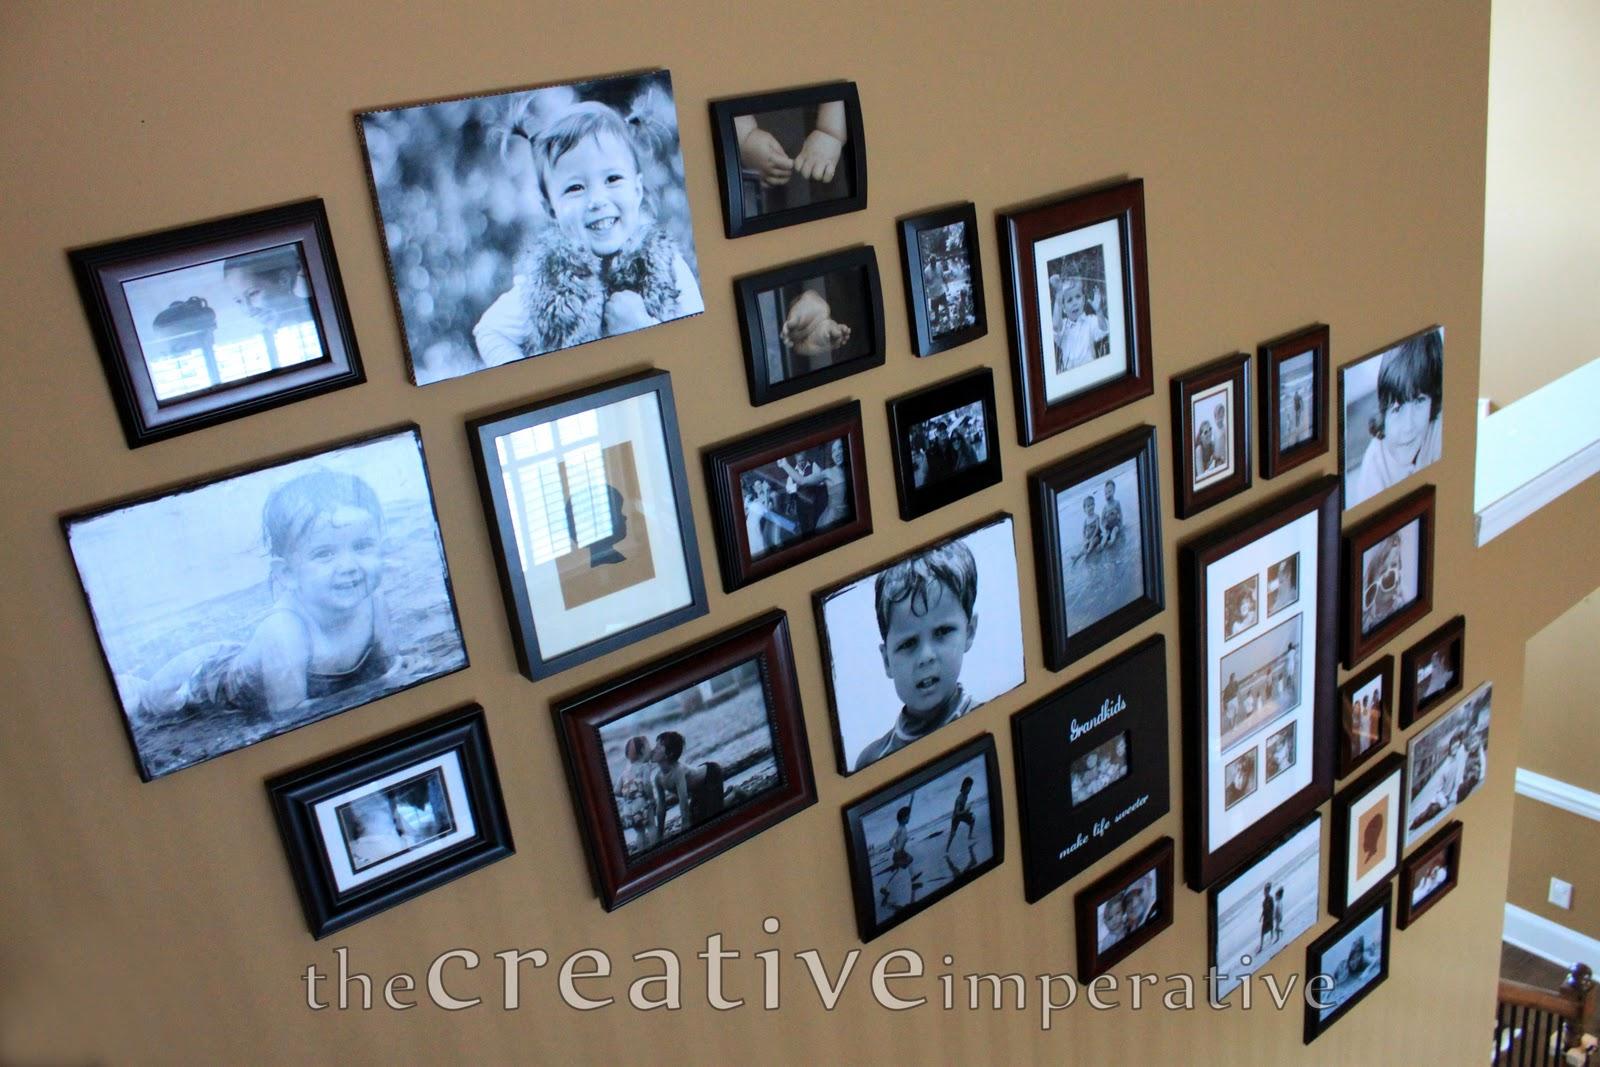 The Creative Imperative